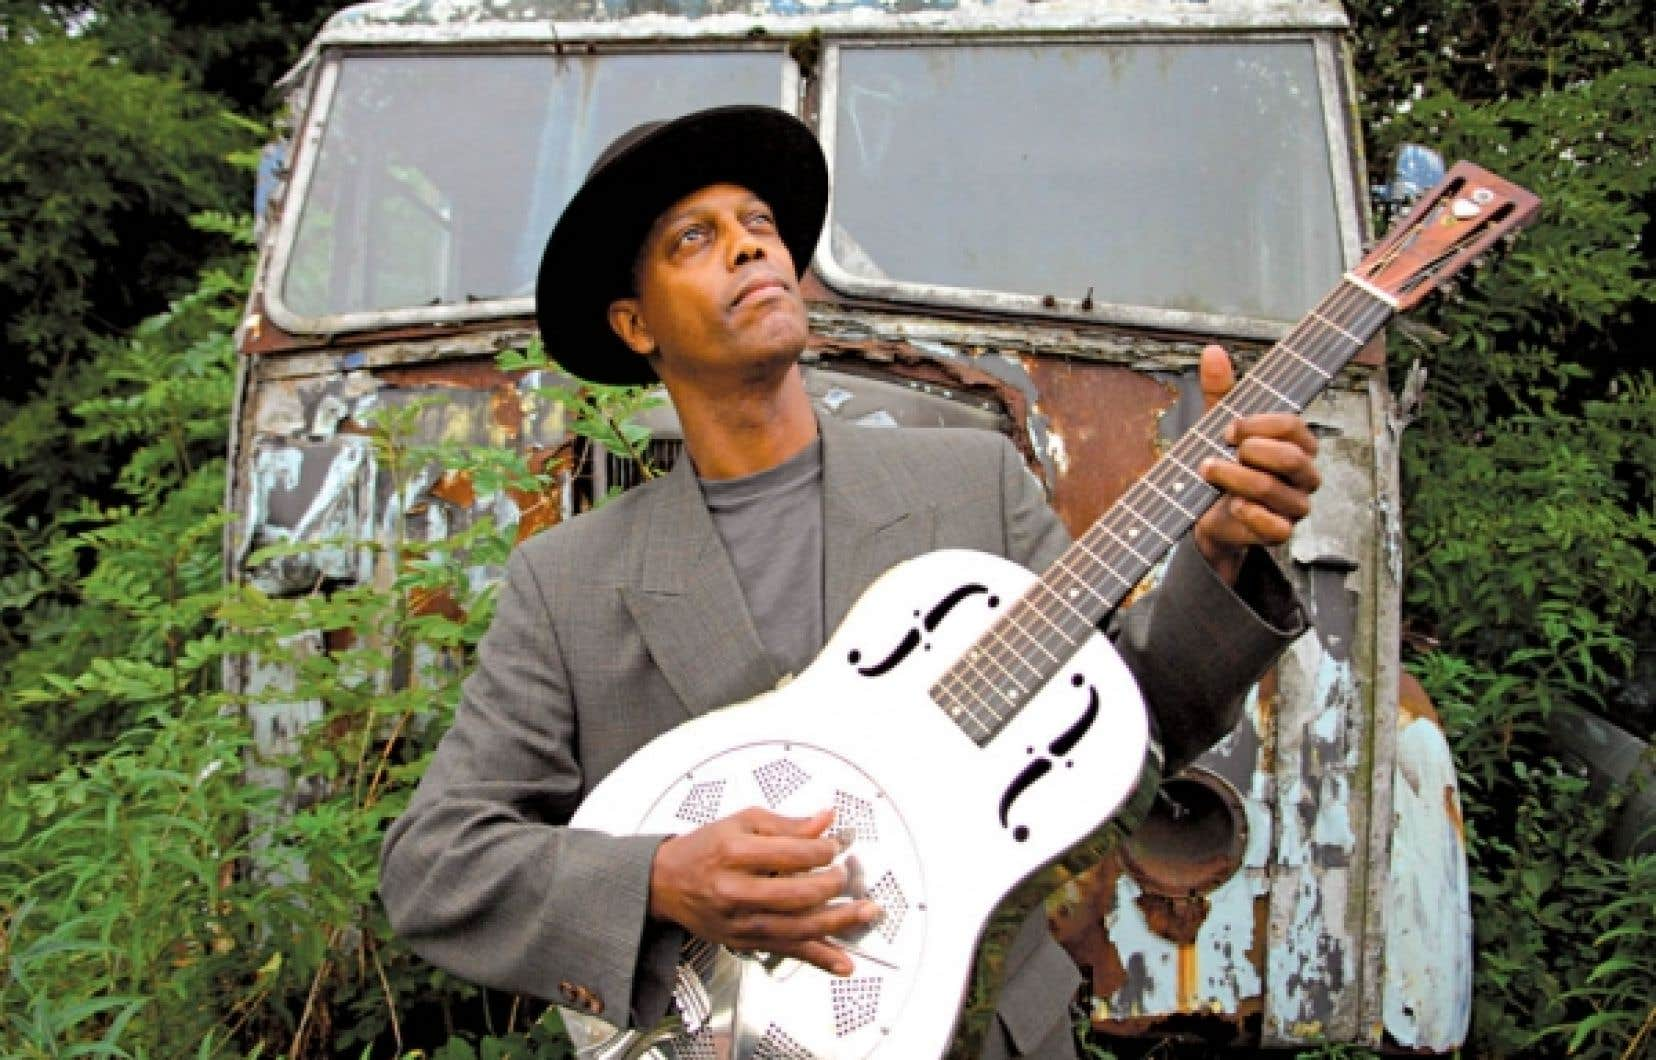 Le guitariste Eric Bibb... troubadour.<br />